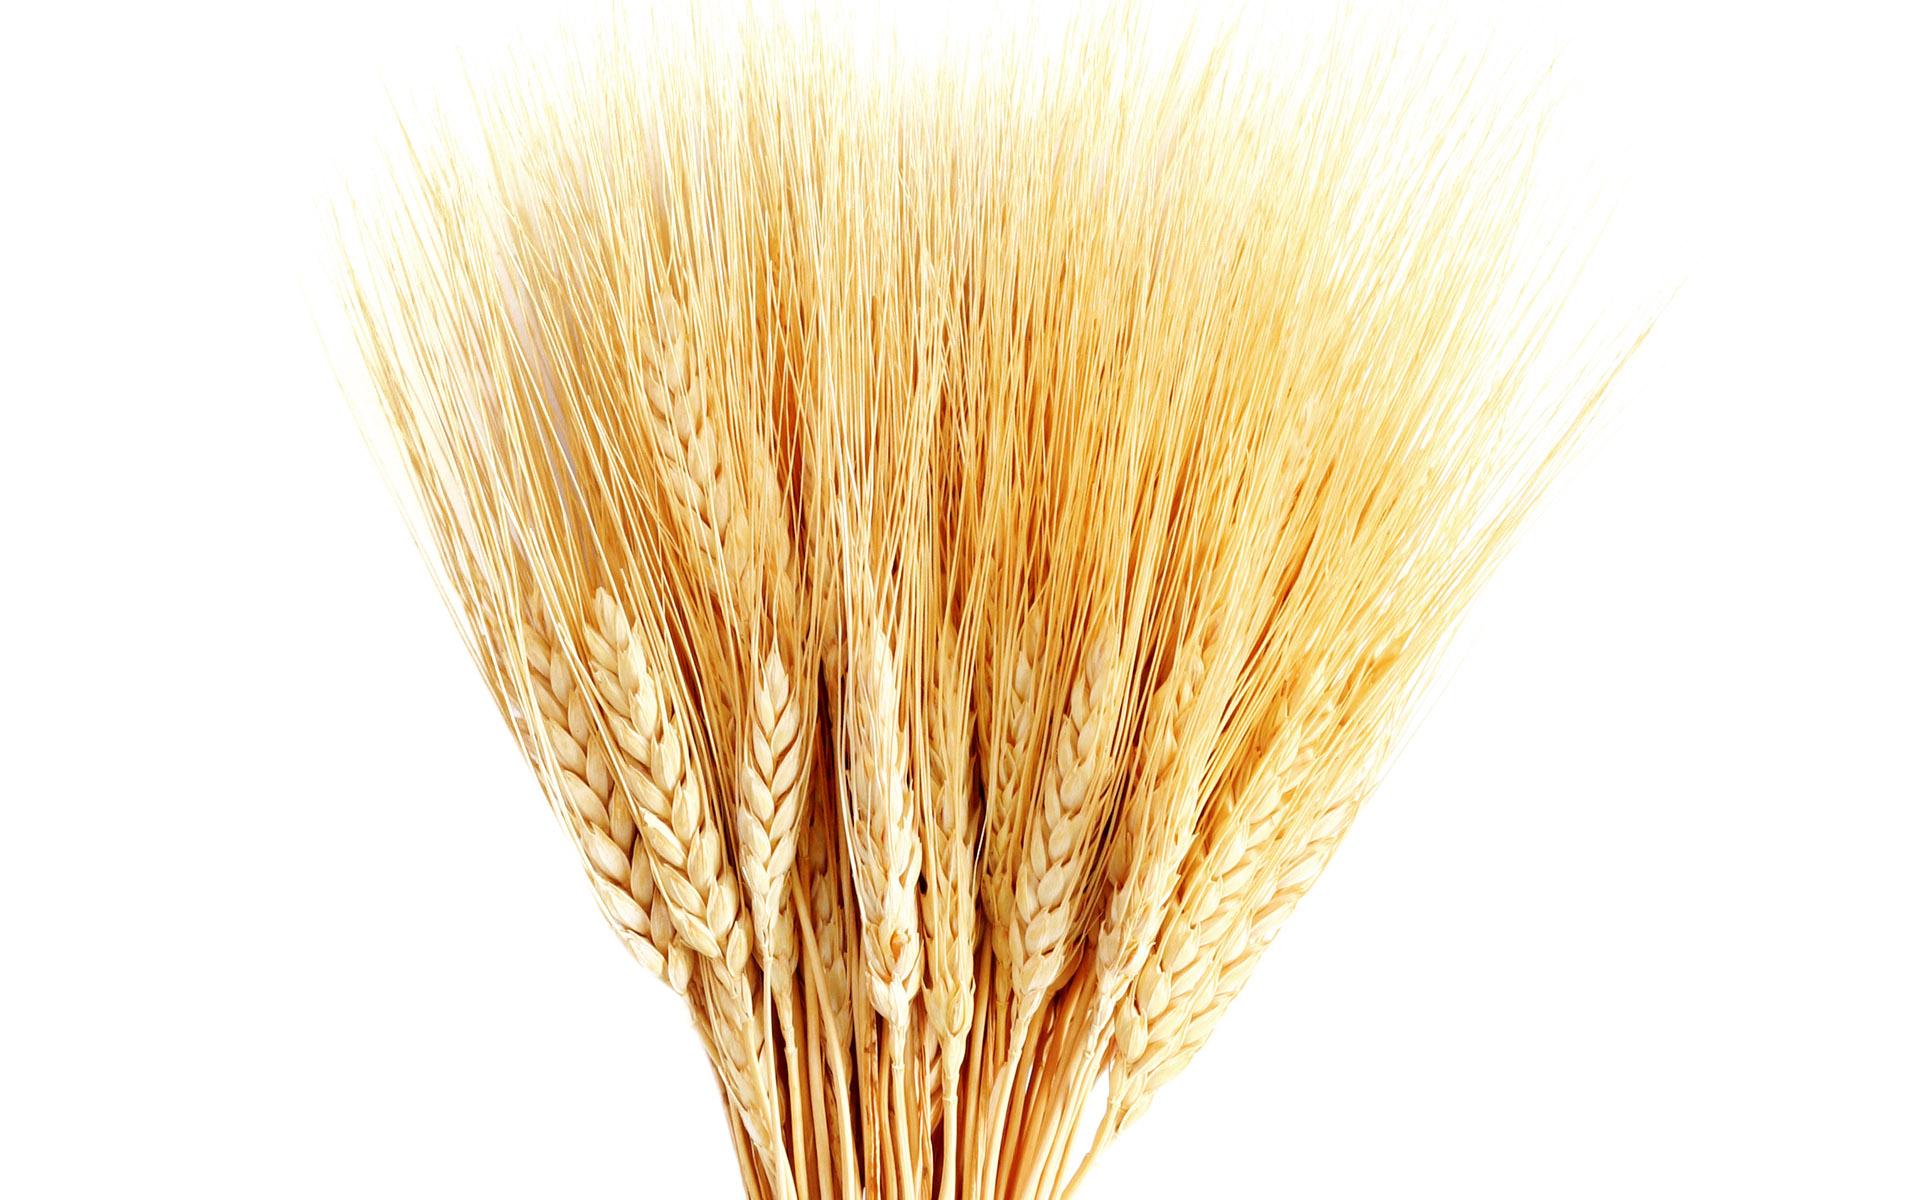 8157-hd-wheat-crop-material